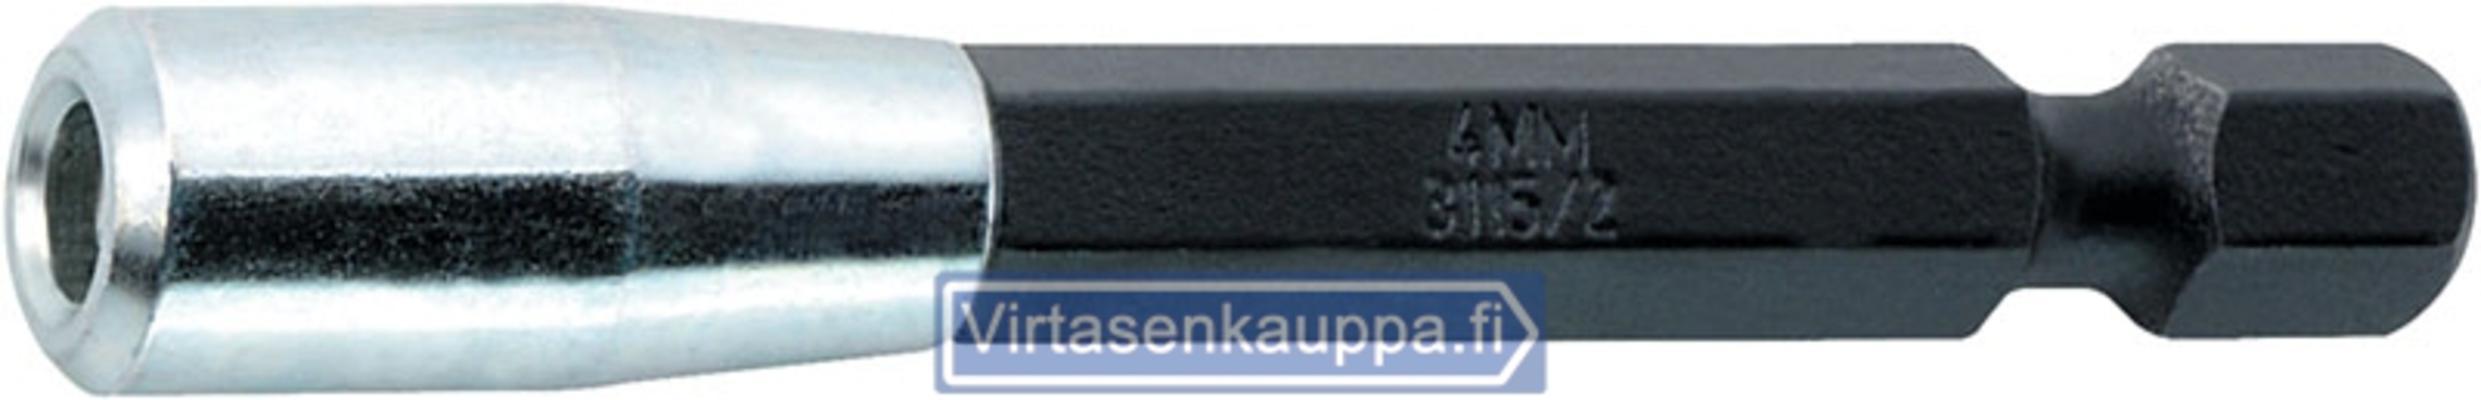 Bits-pidin 1/4x60 mm, Stahlwille - Bits-pidin 1/4x60 mm